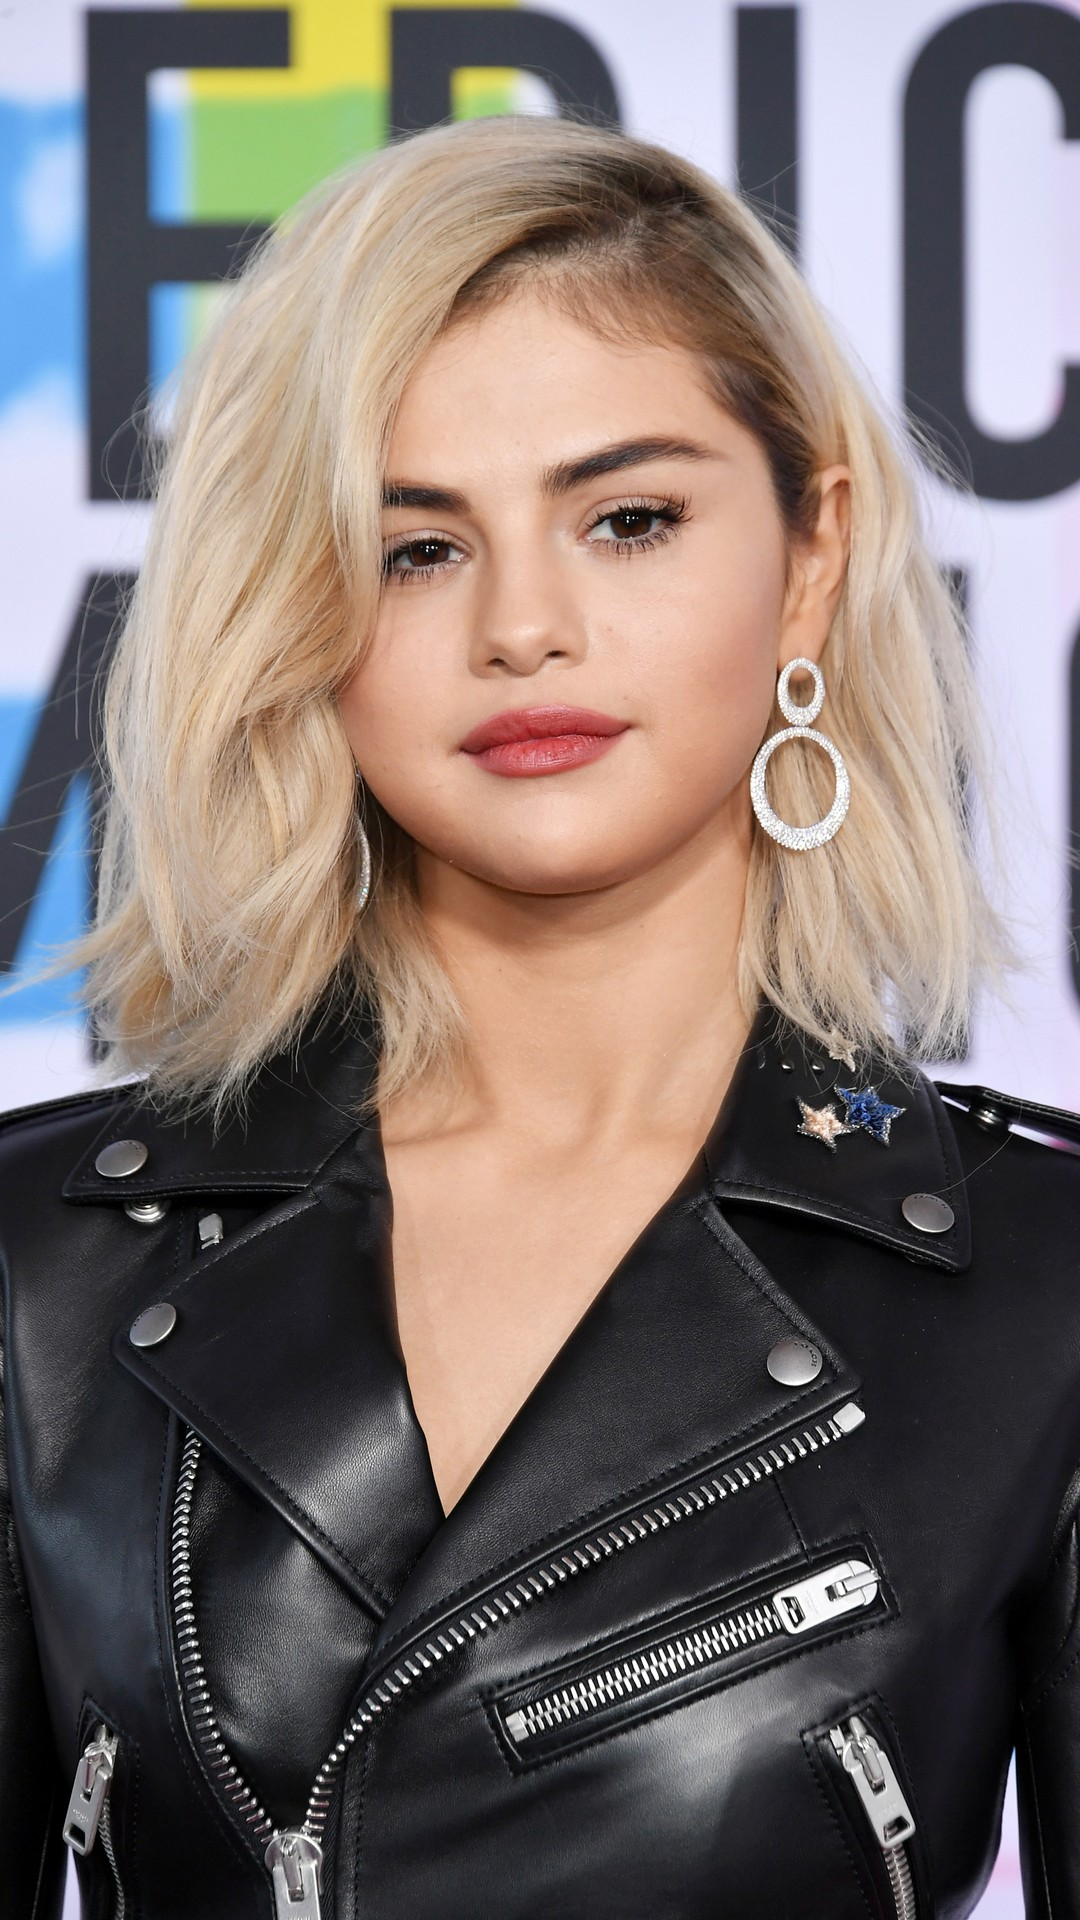 Selena Gomez Blonde iPhone Wallpaper 2020 3D iPhone Wallpaper 1080x1920